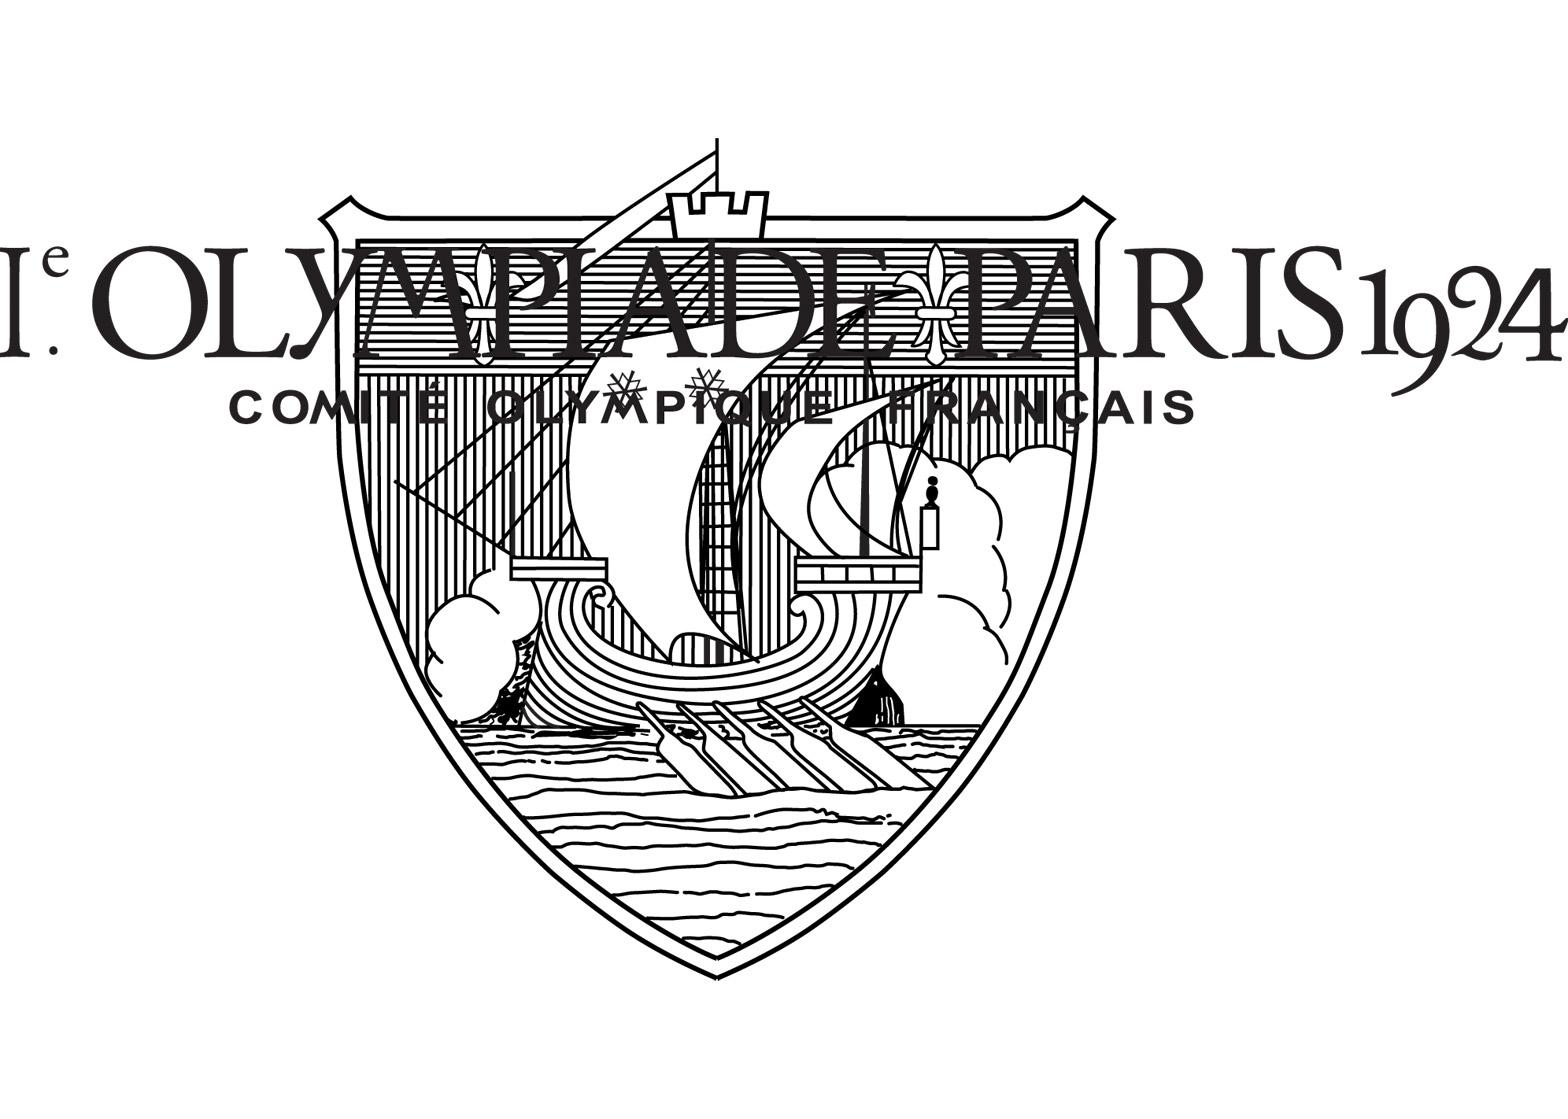 Logo of the 1924 Paris Olympics